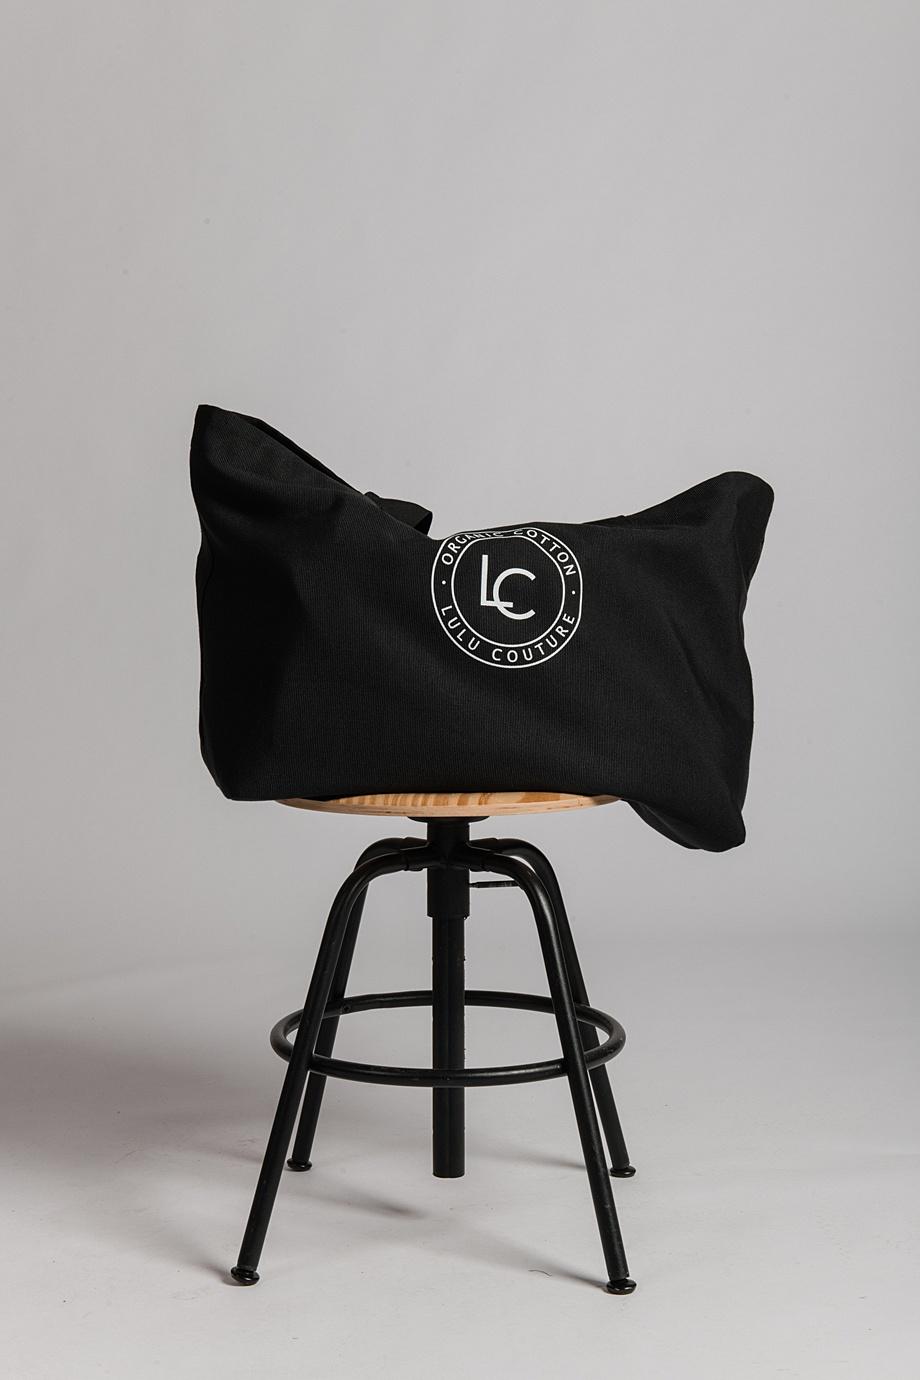 LC Torba (Crna) - Onesize - 790kn - 100% pamuk - LuLu Couture